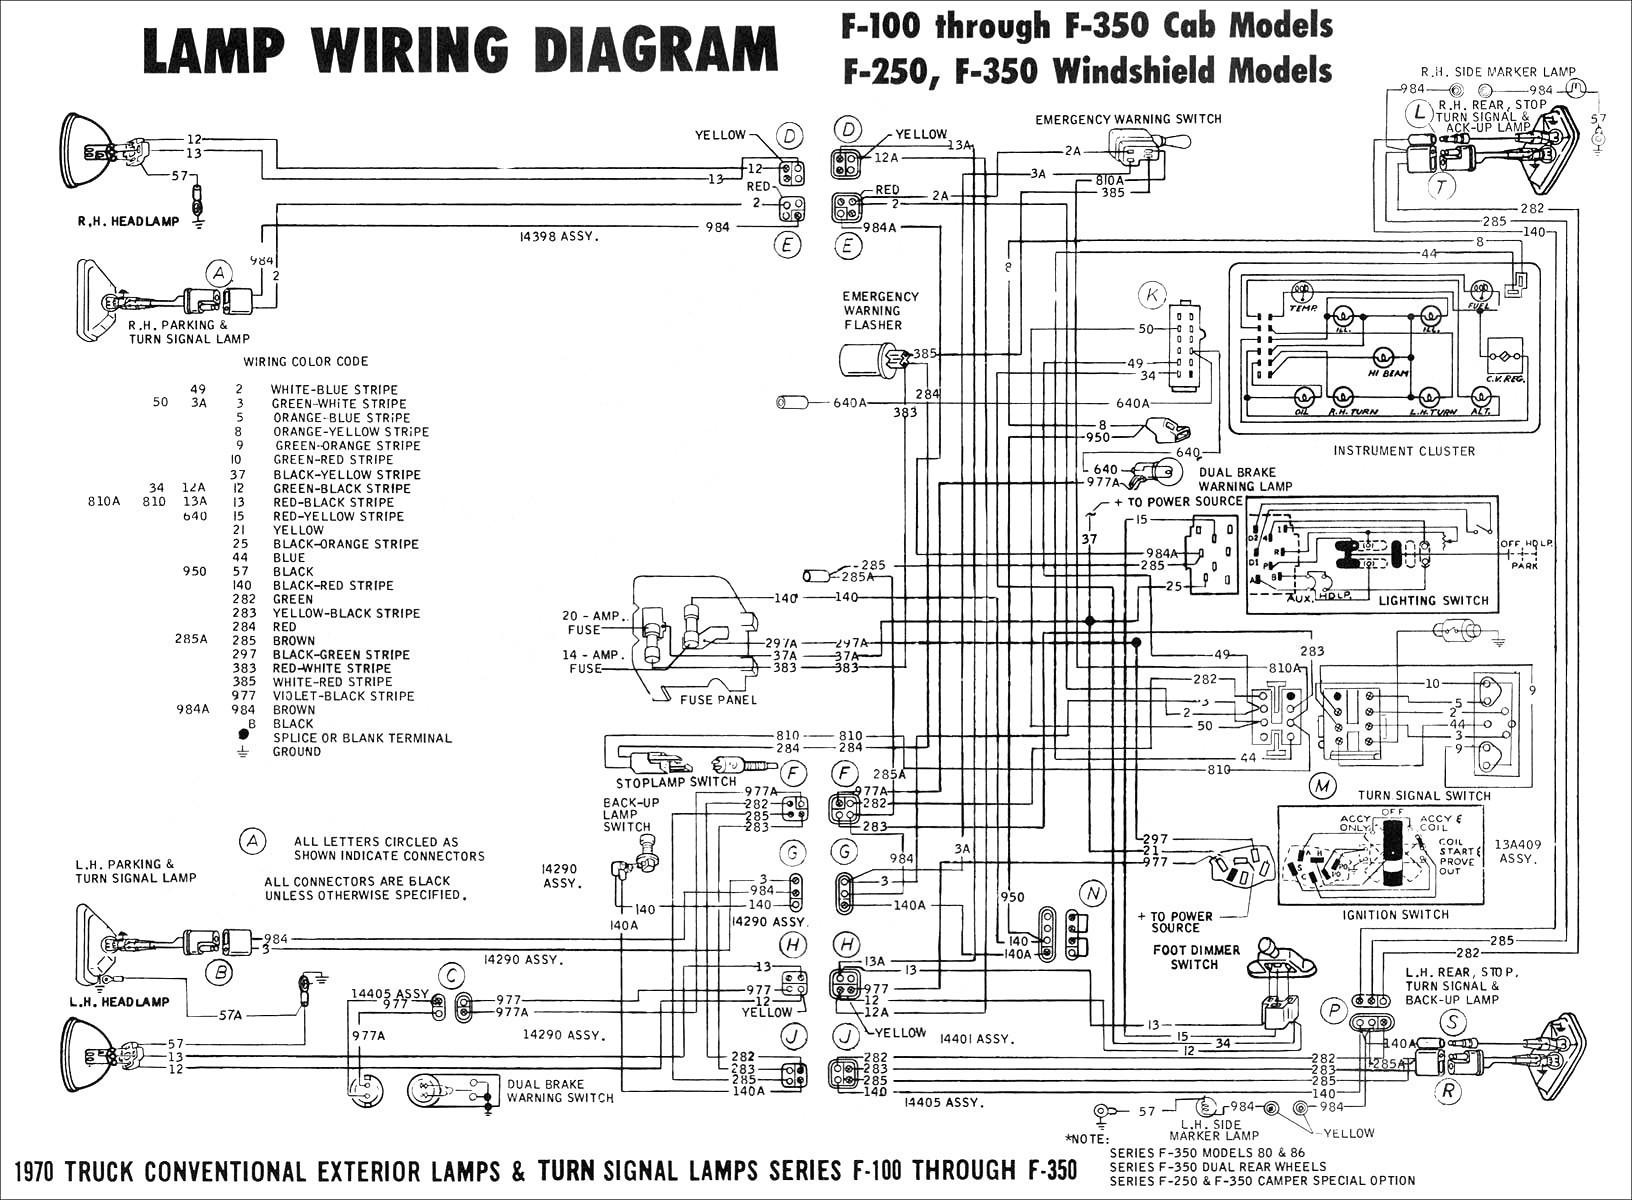 2000 Vw Jetta Radio Wiring Diagram 2000 Audi A4 Radio Wiring Diagram Valid 1999 Nissan Altima Radio Of 2000 Vw Jetta Radio Wiring Diagram